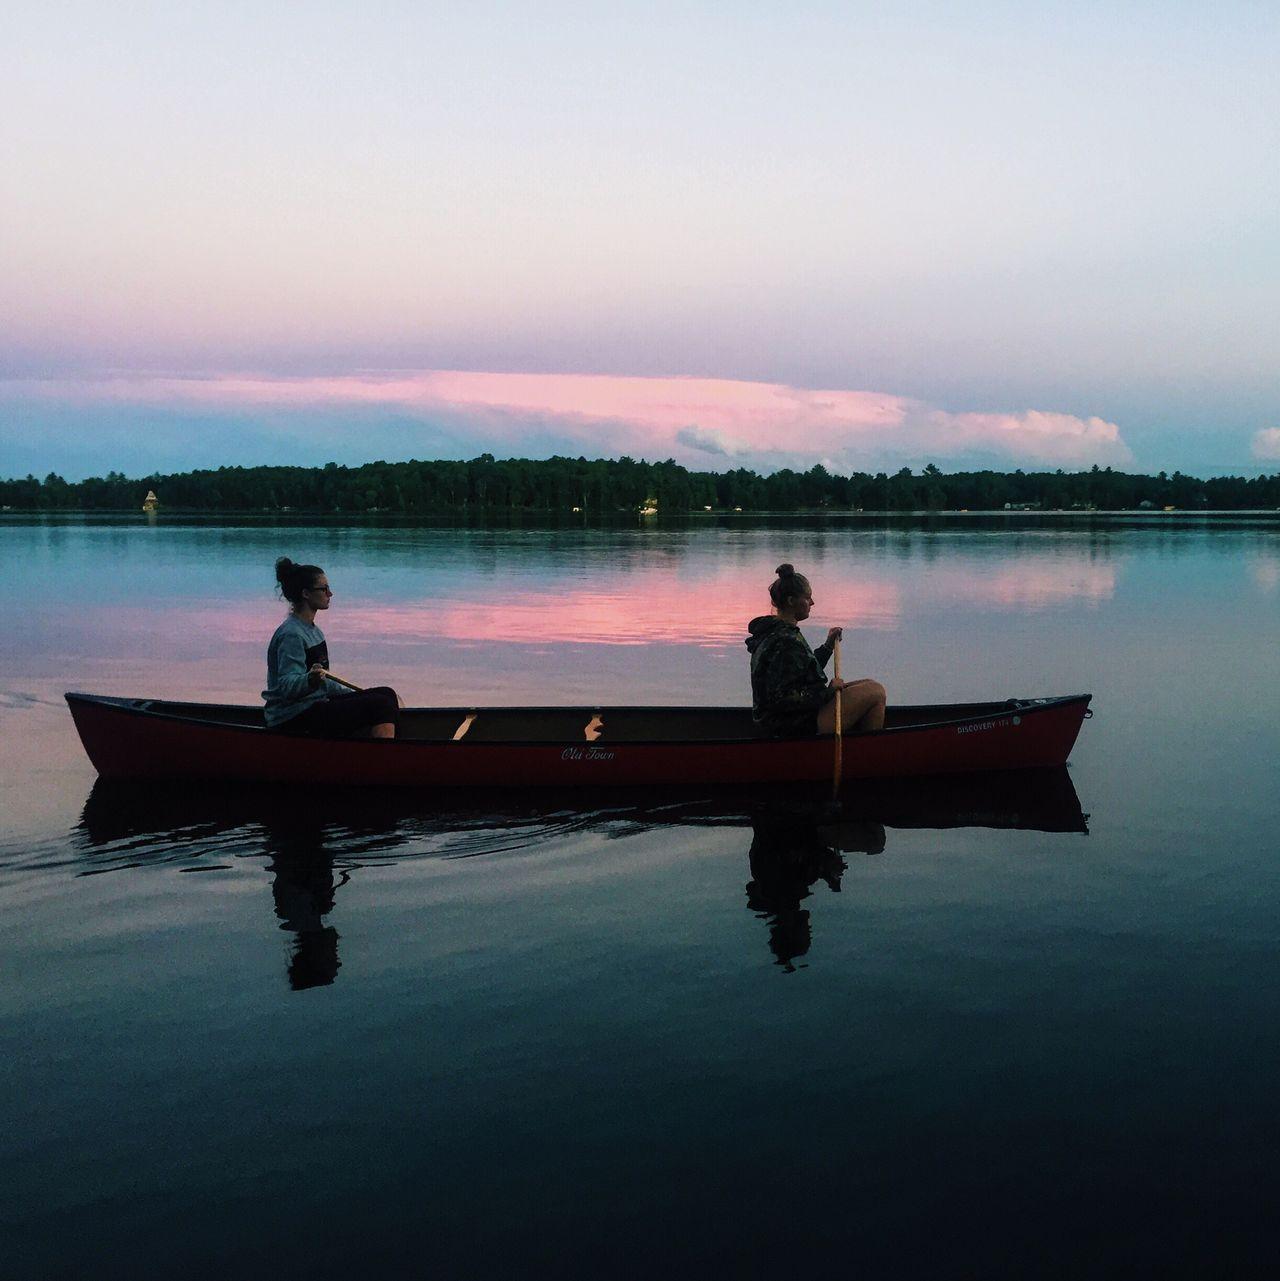 reflection, water, sunset, nature, men